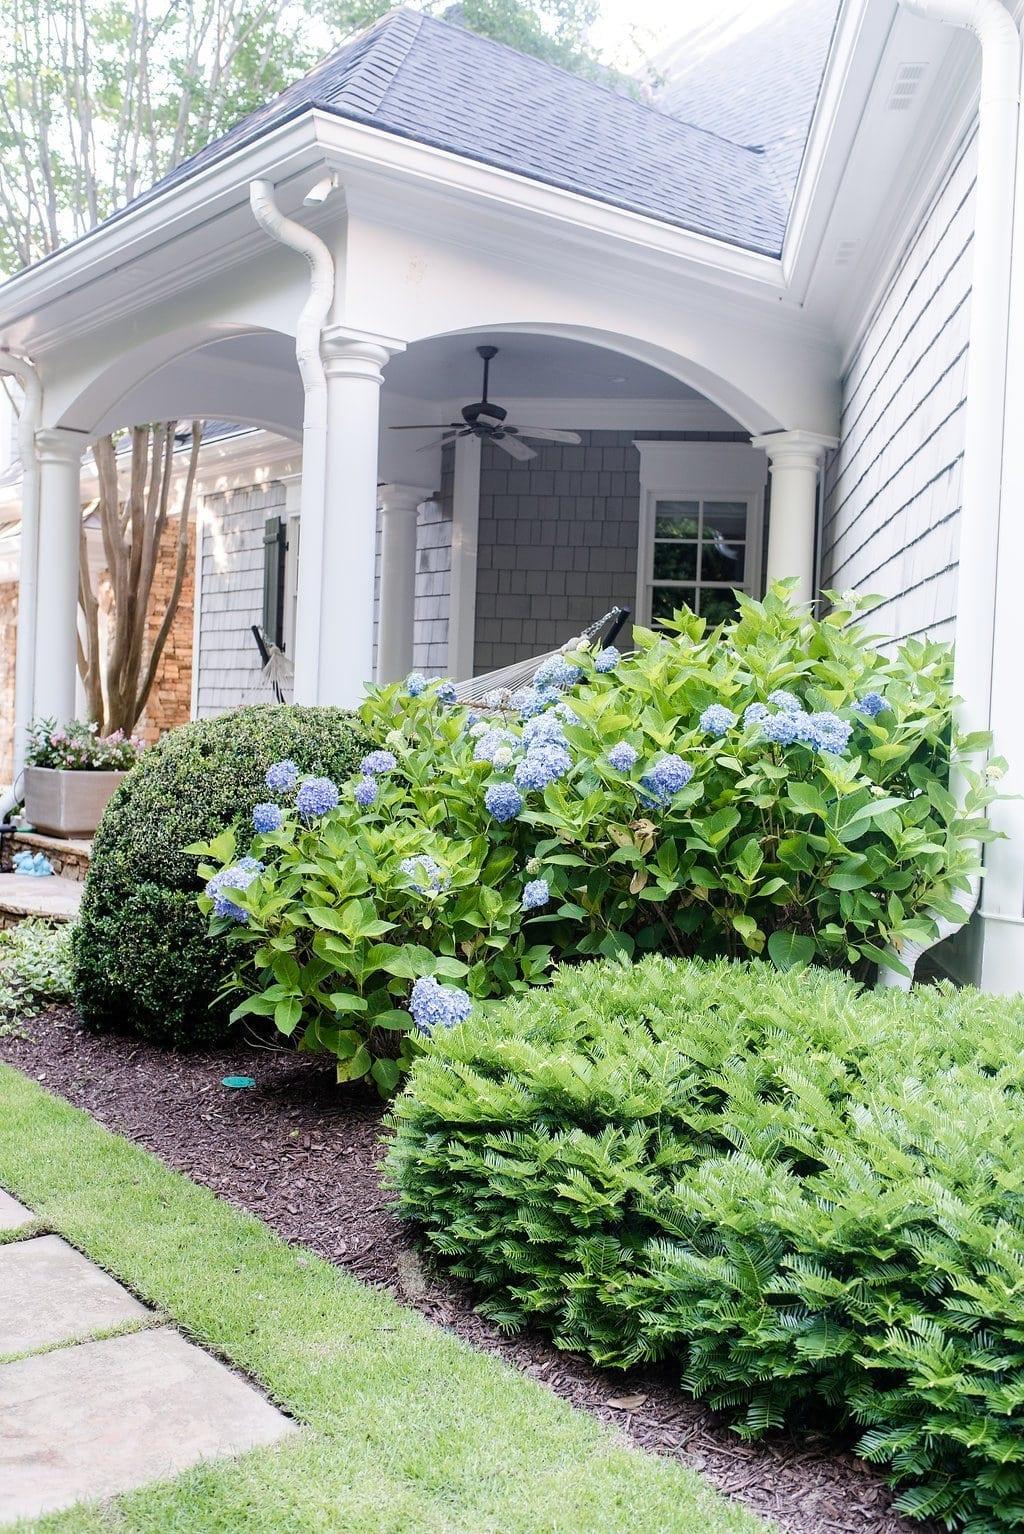 Where to plant hydrangea. Atlanta home with cedar siding and blue Endless Summer hydrangea bush.